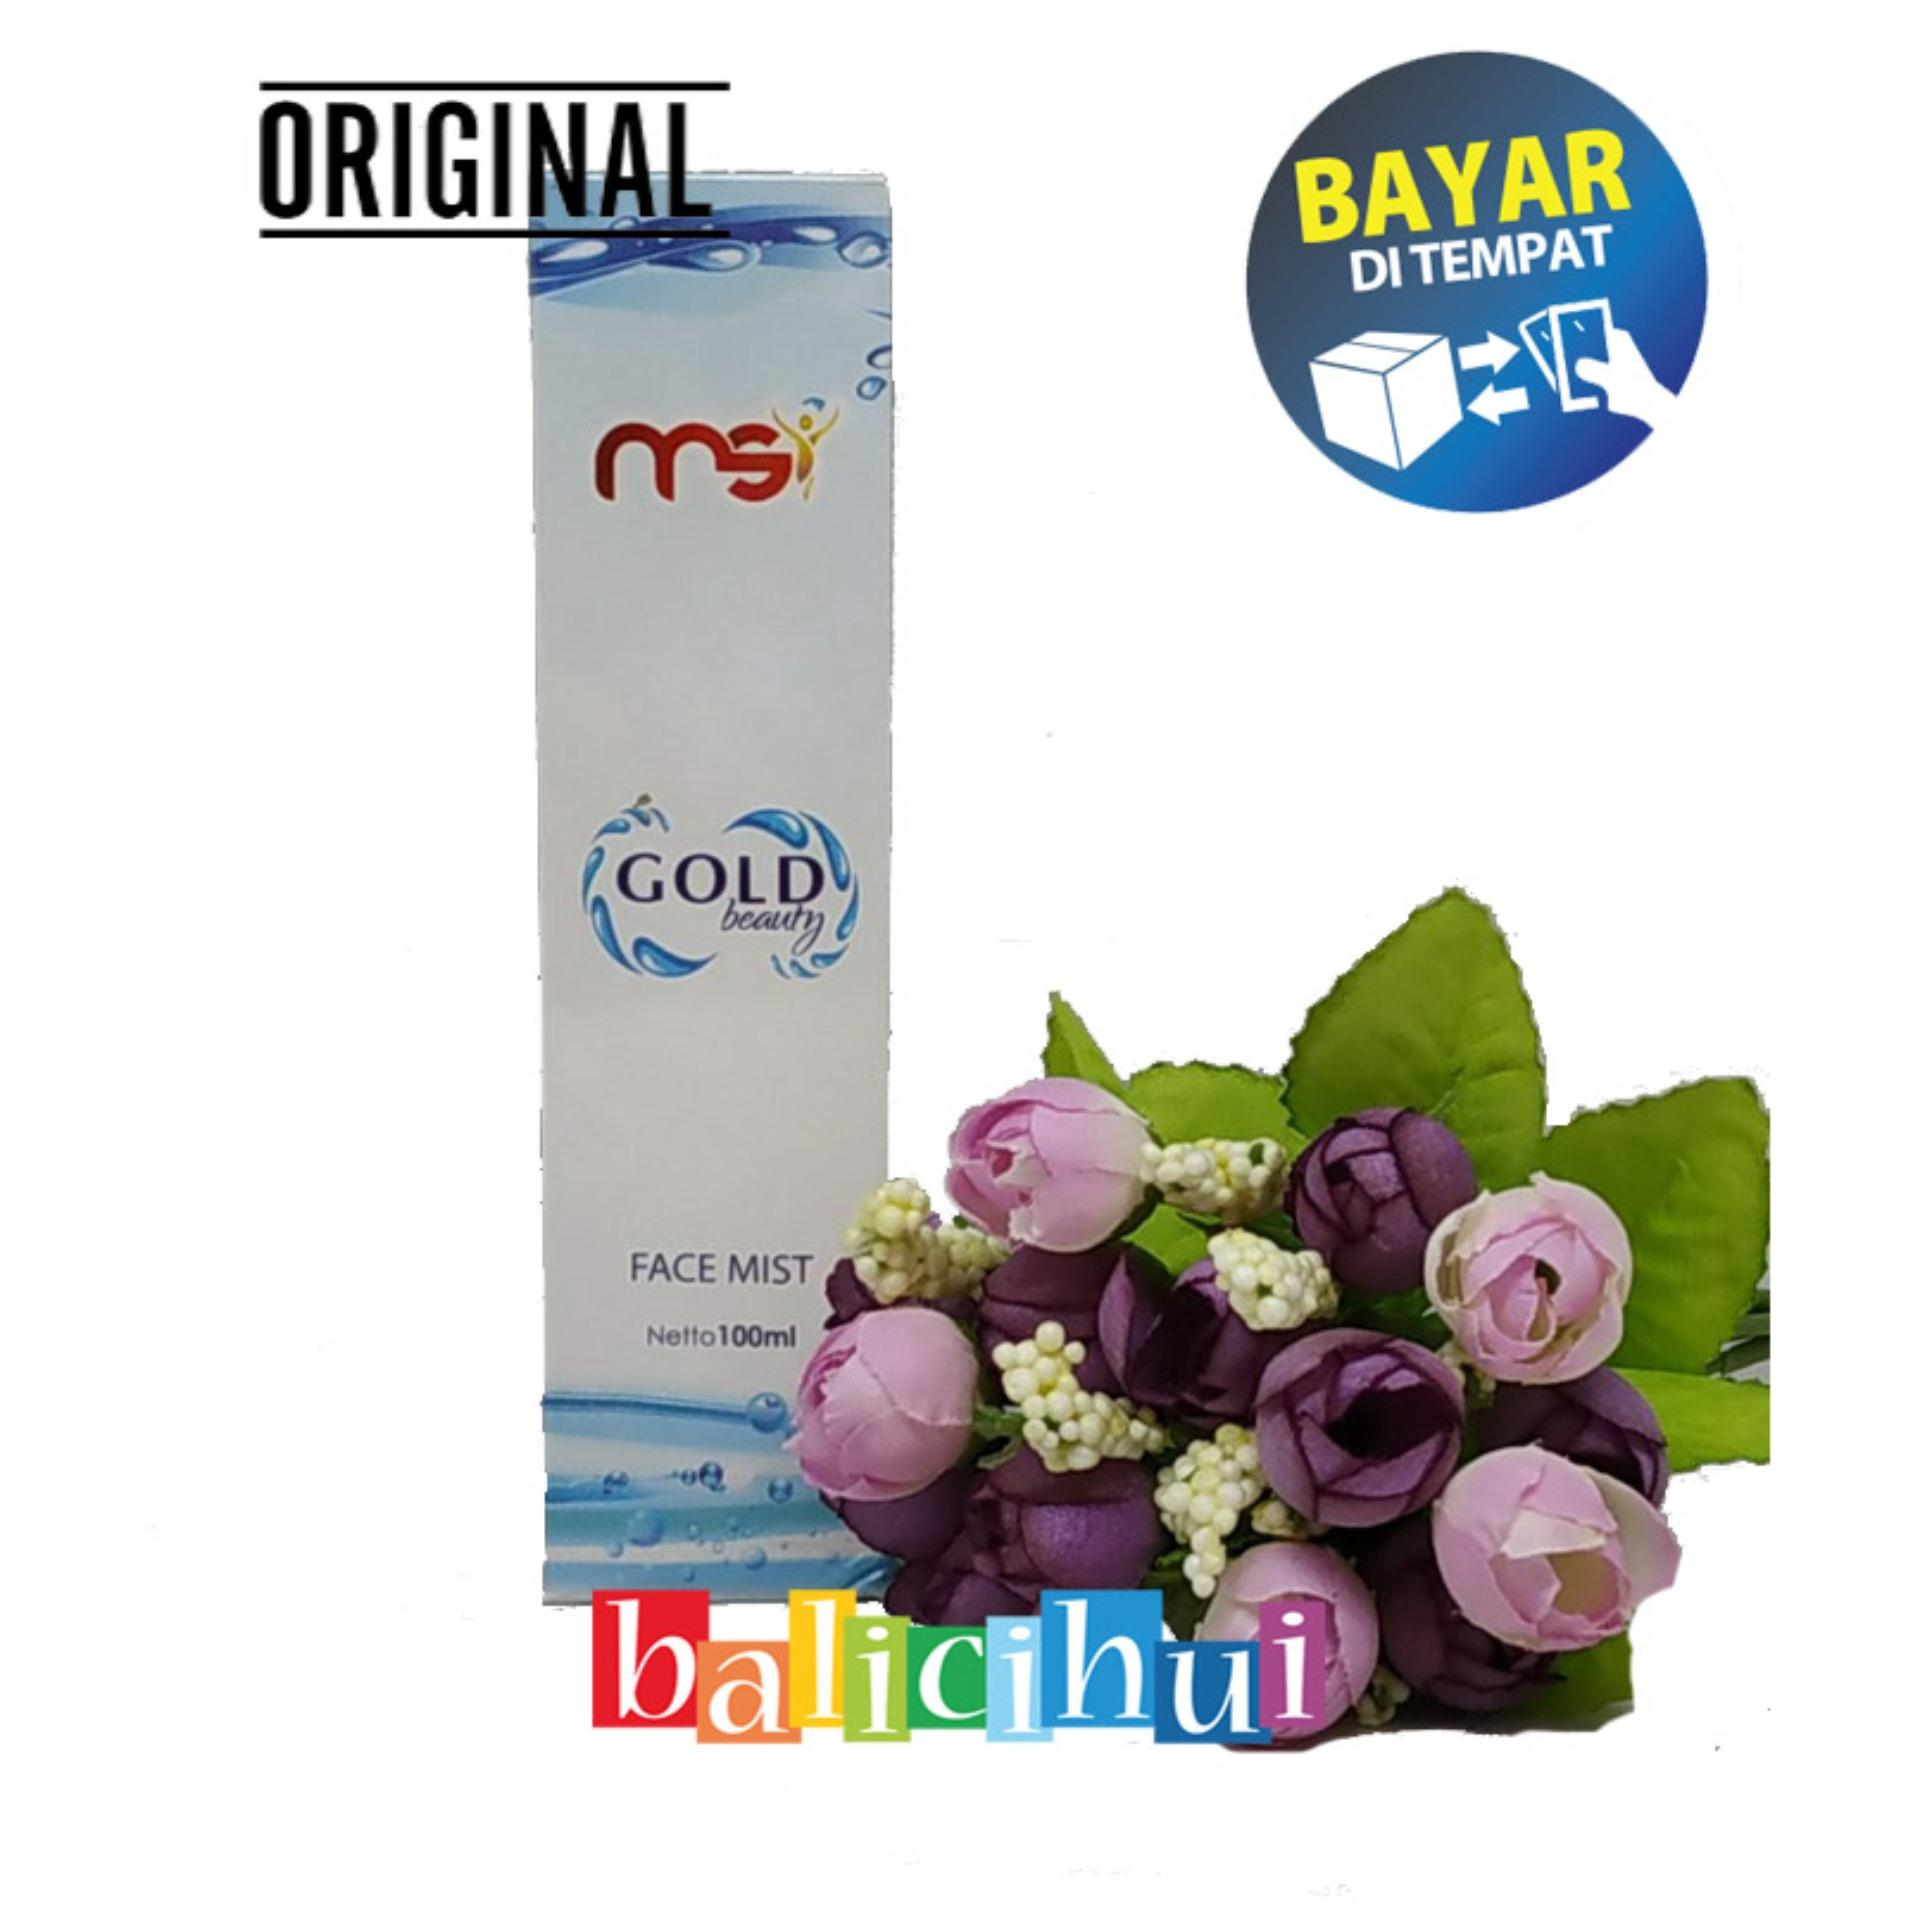 balicihui msi gold beauty face mist 100% original